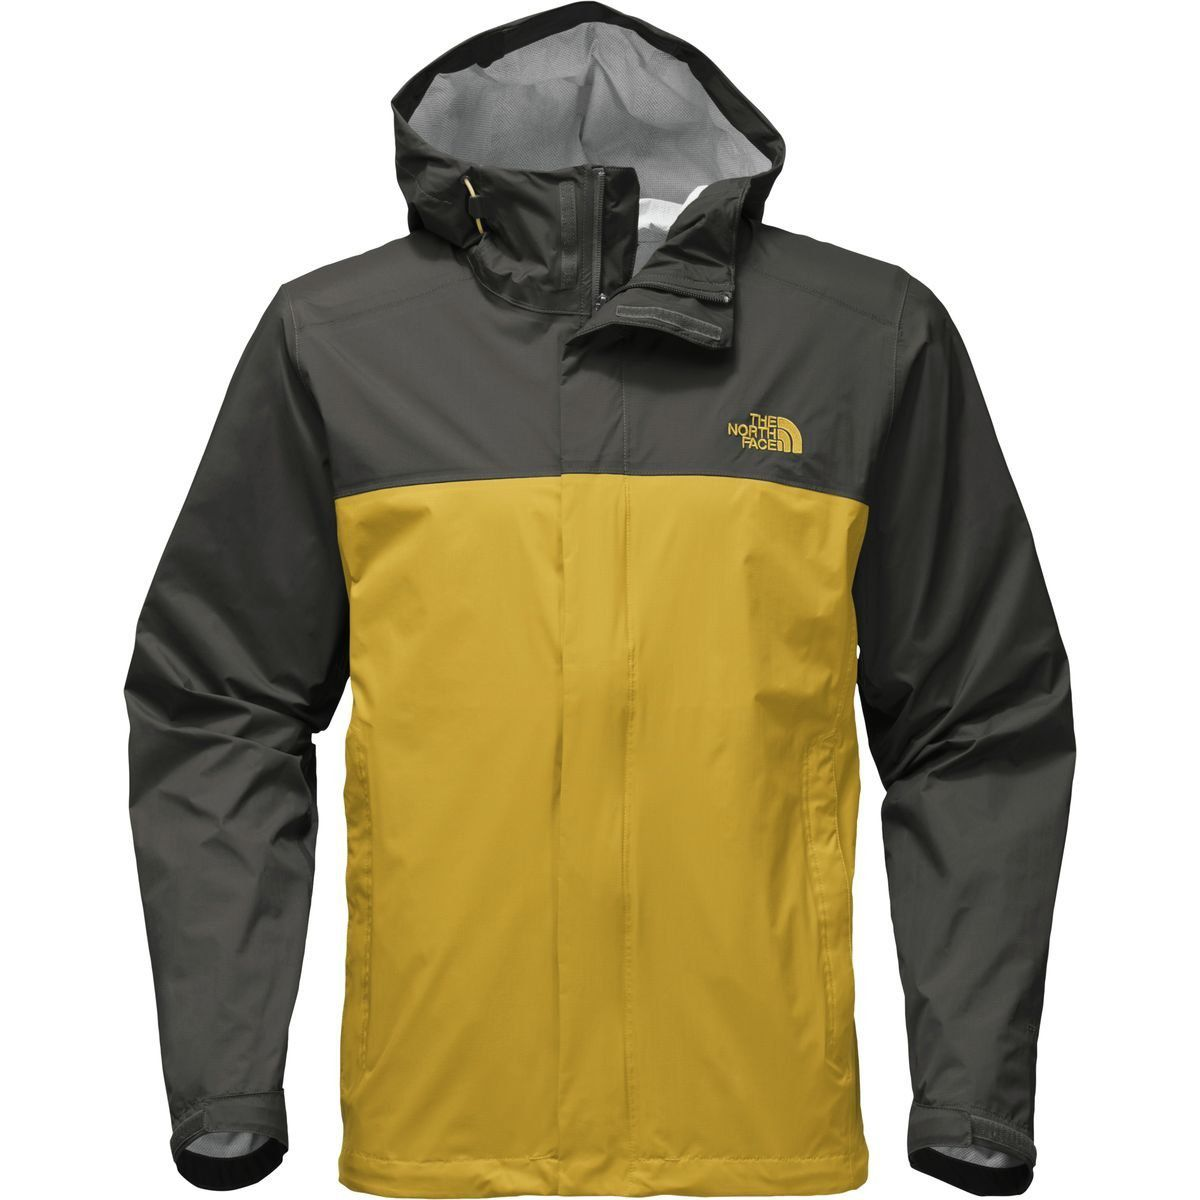 53612d59c7 The North Face Venture 2 Jacket. Amazon